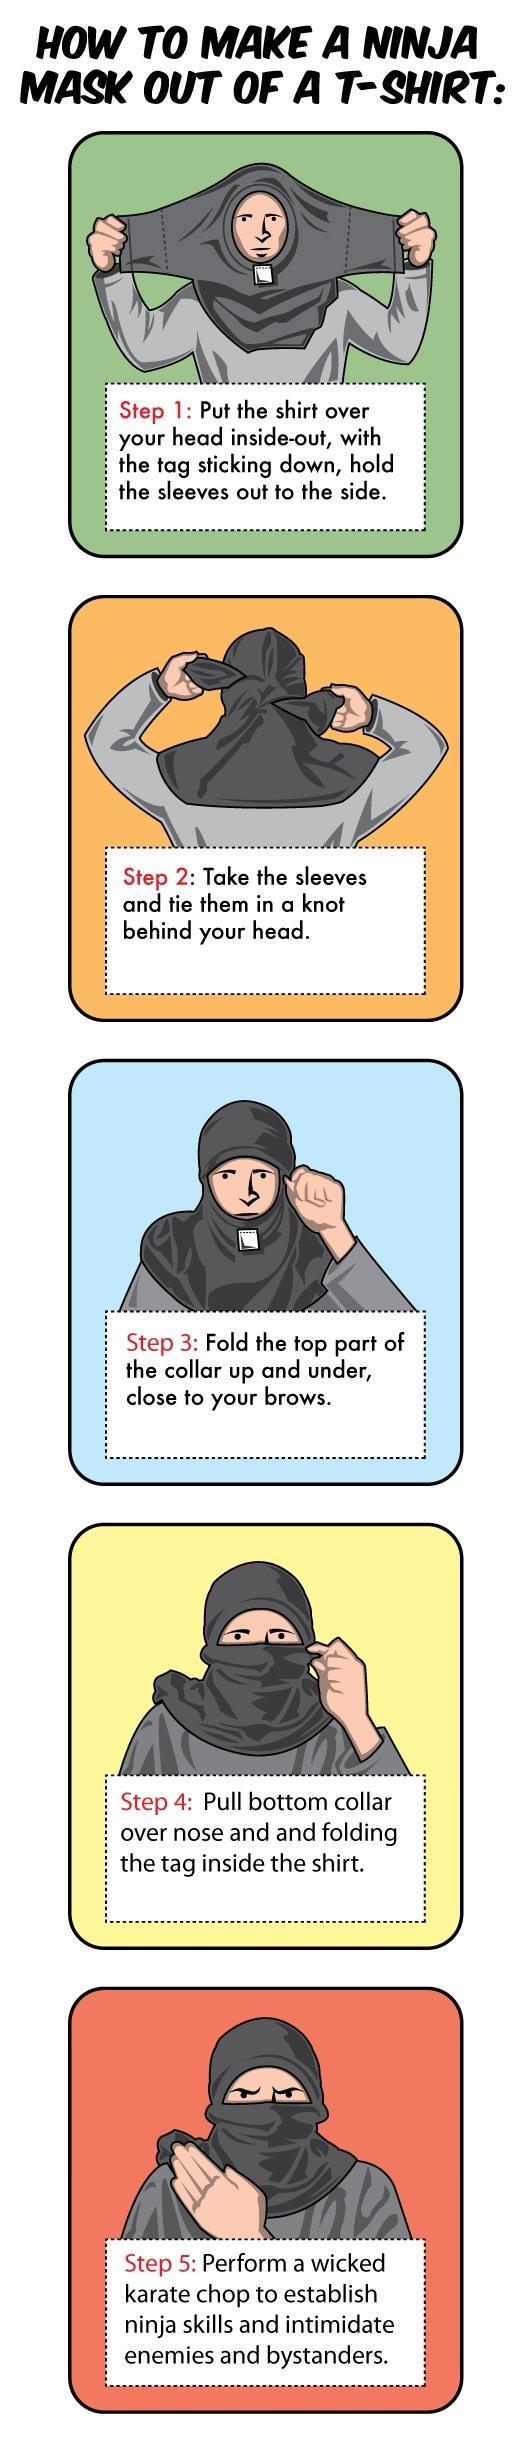 how to make ninja stuff